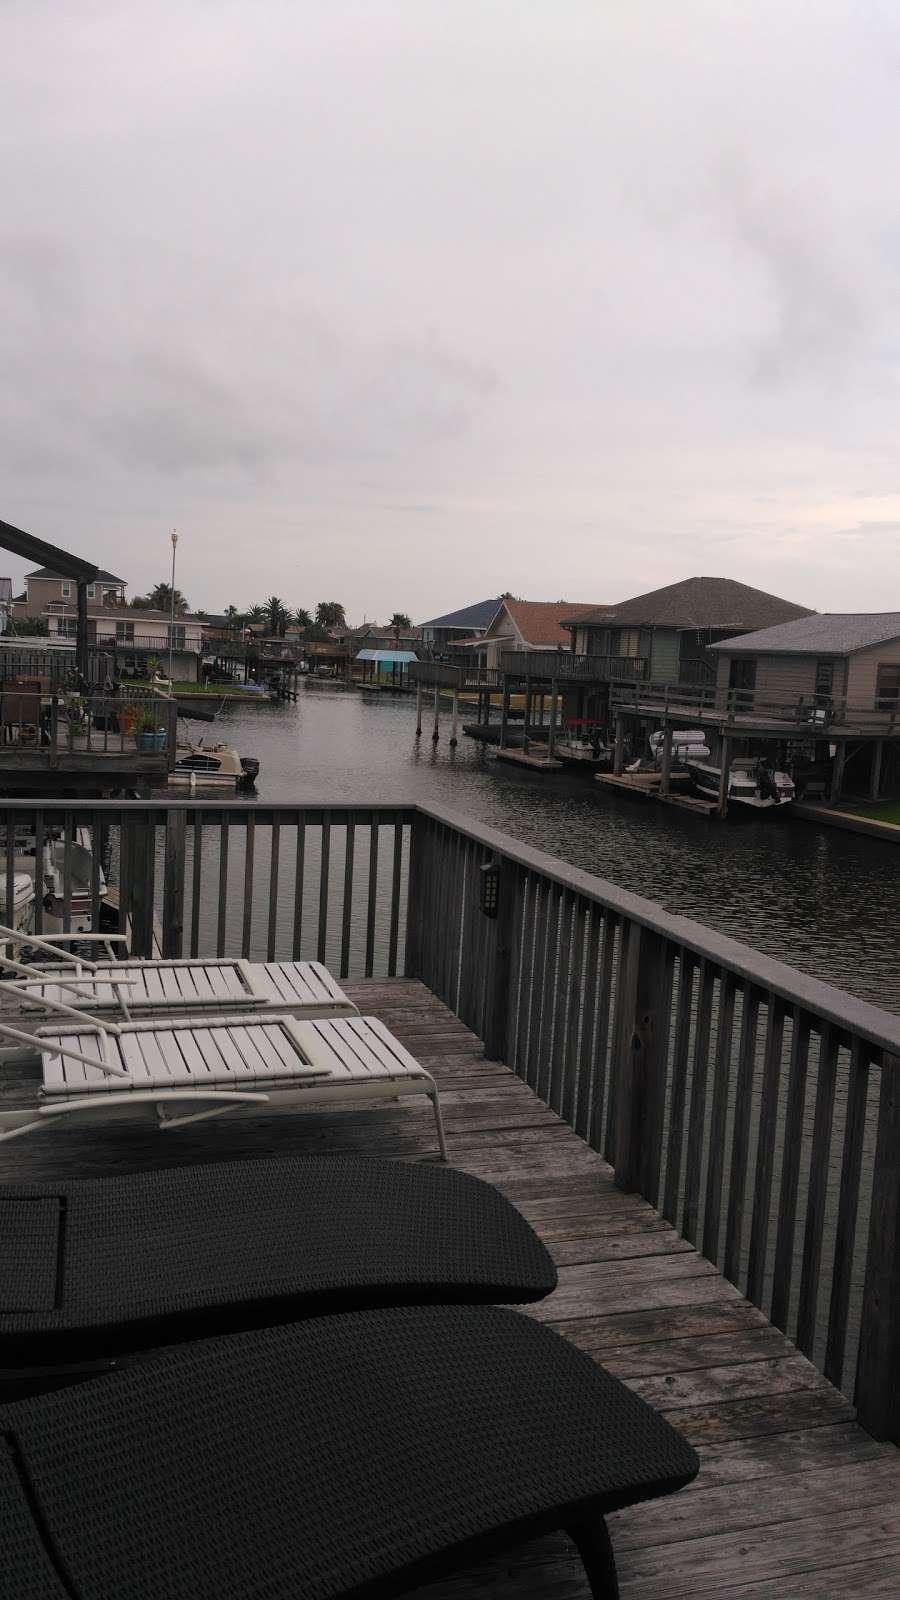 Bay Breeze Waterfront Vacation House - real estate agency    Photo 3 of 10   Address: 16703 Managua Way, Galveston, TX 77554, USA   Phone: (832) 818-4234